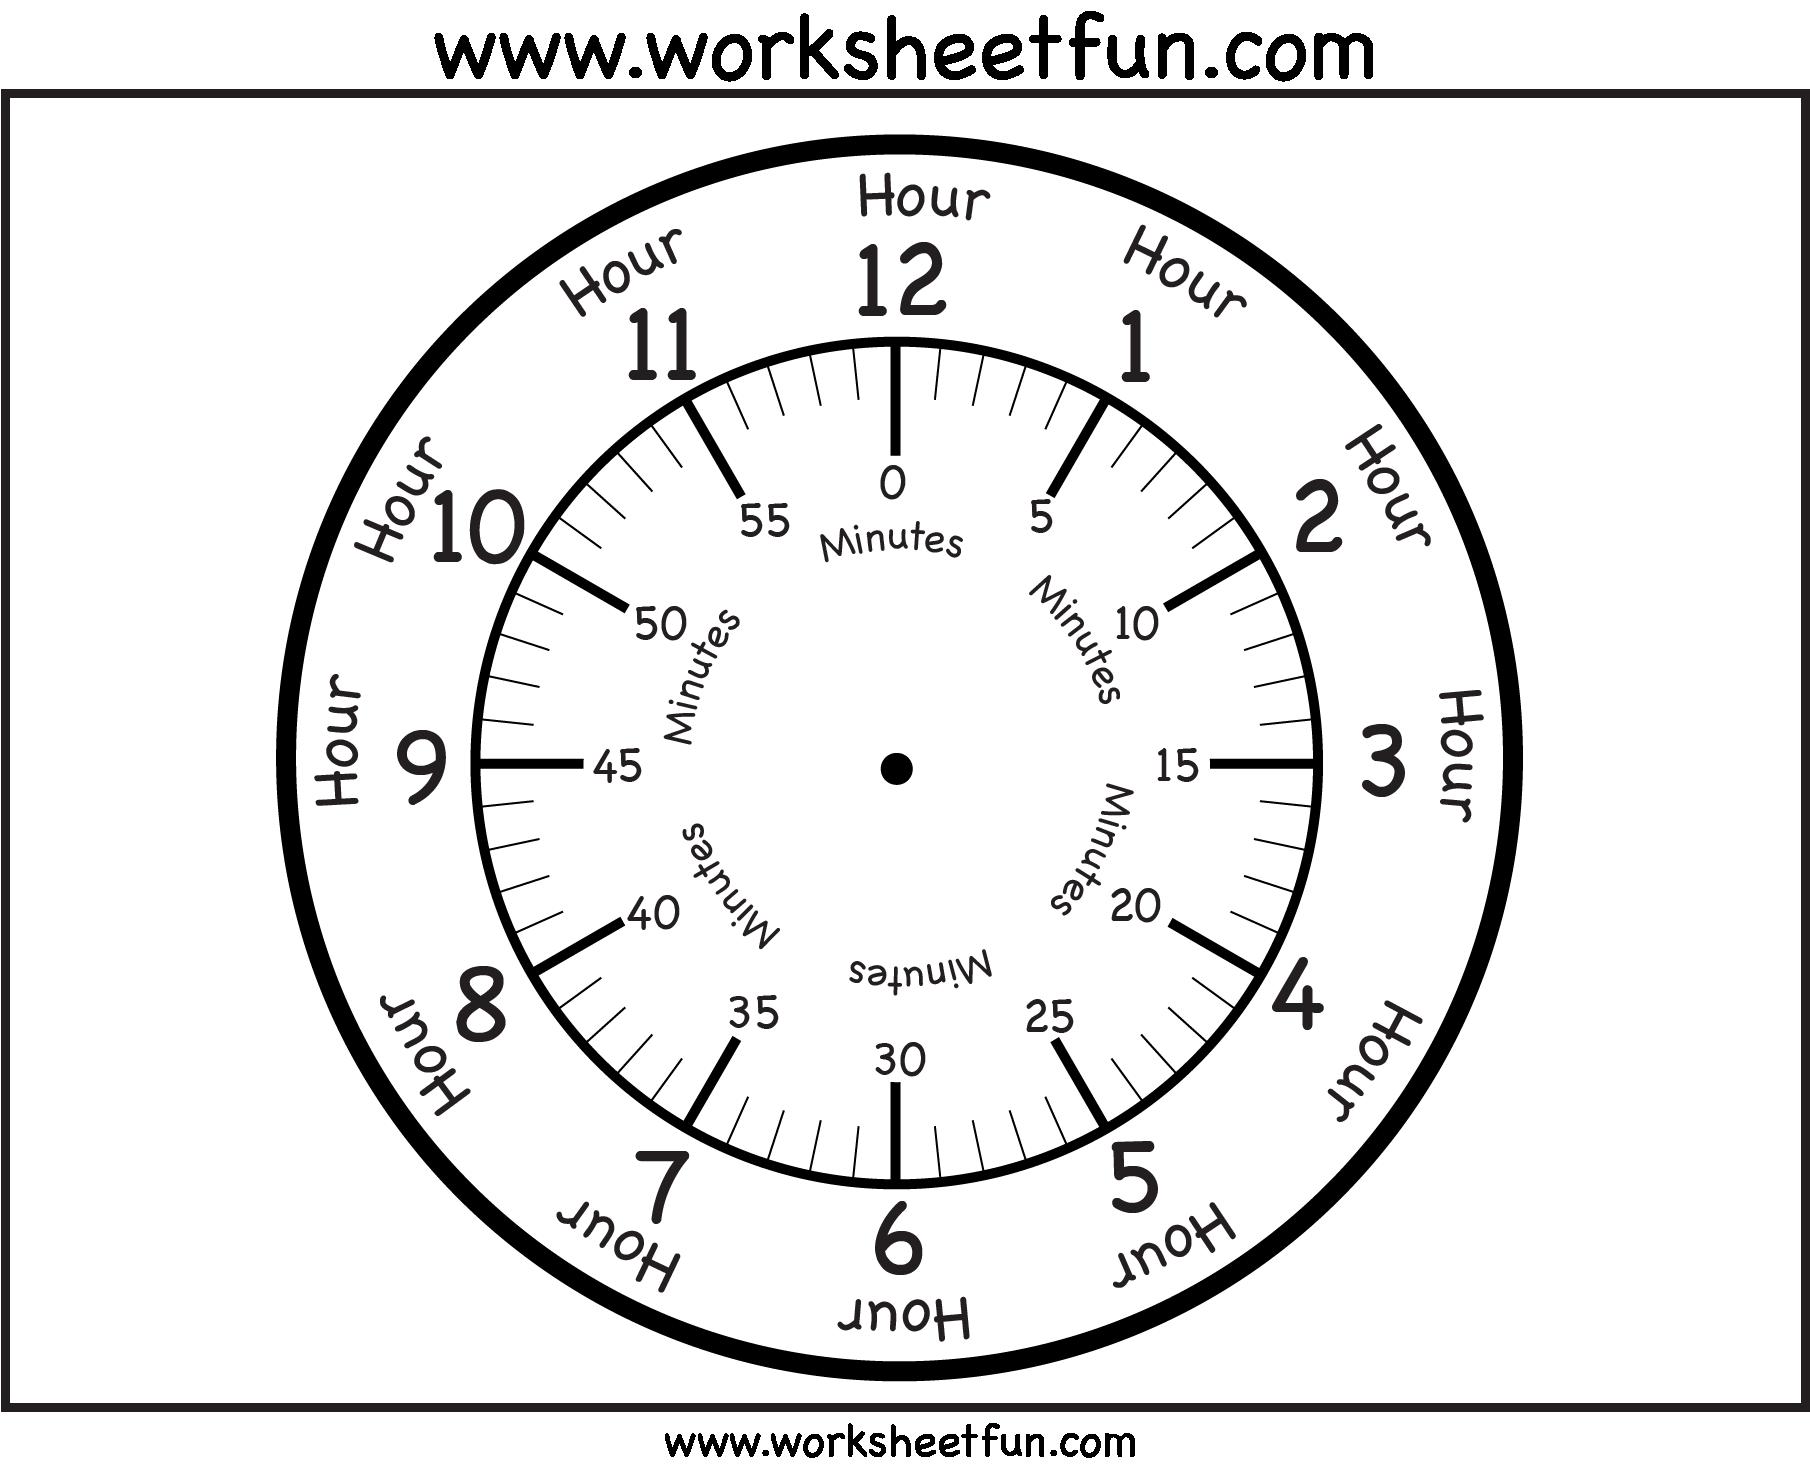 Time Printable Clock Face 4 Worksheets Clock Worksheets Time Worksheets Learning Worksheets [ 1481 x 1810 Pixel ]